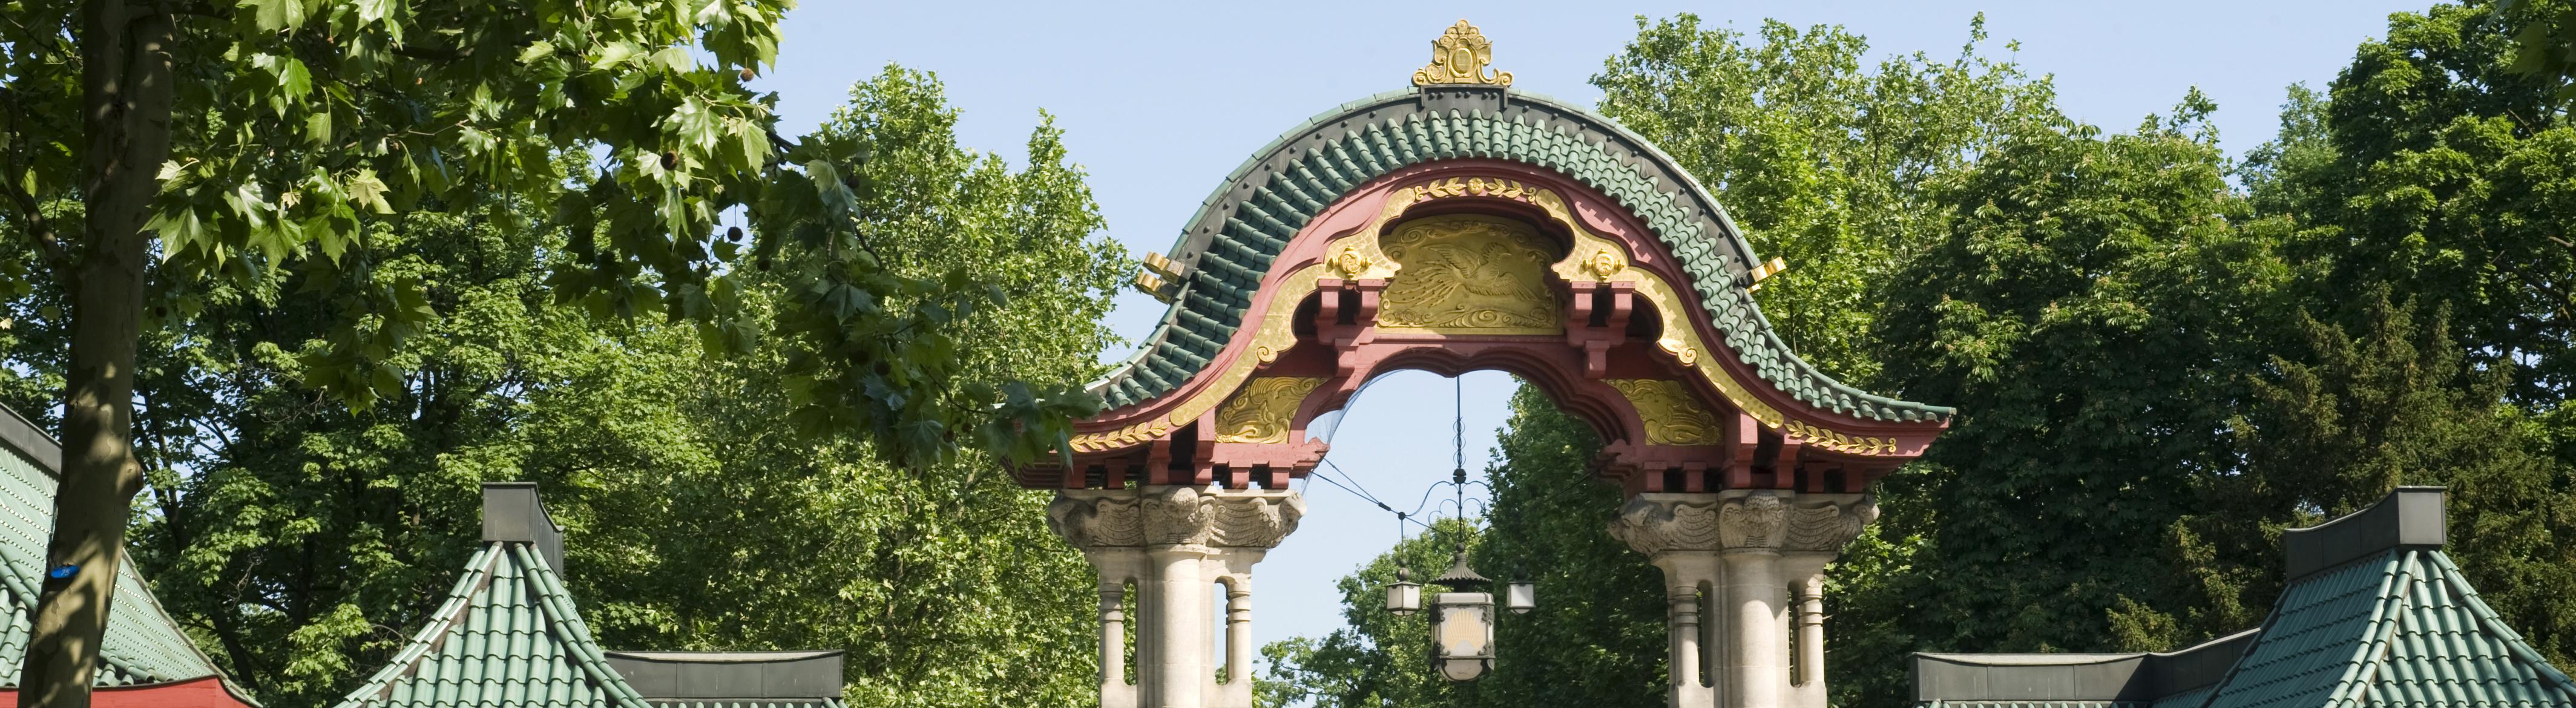 Das Elefantentor - Eingang zum Zoo in Berlin,